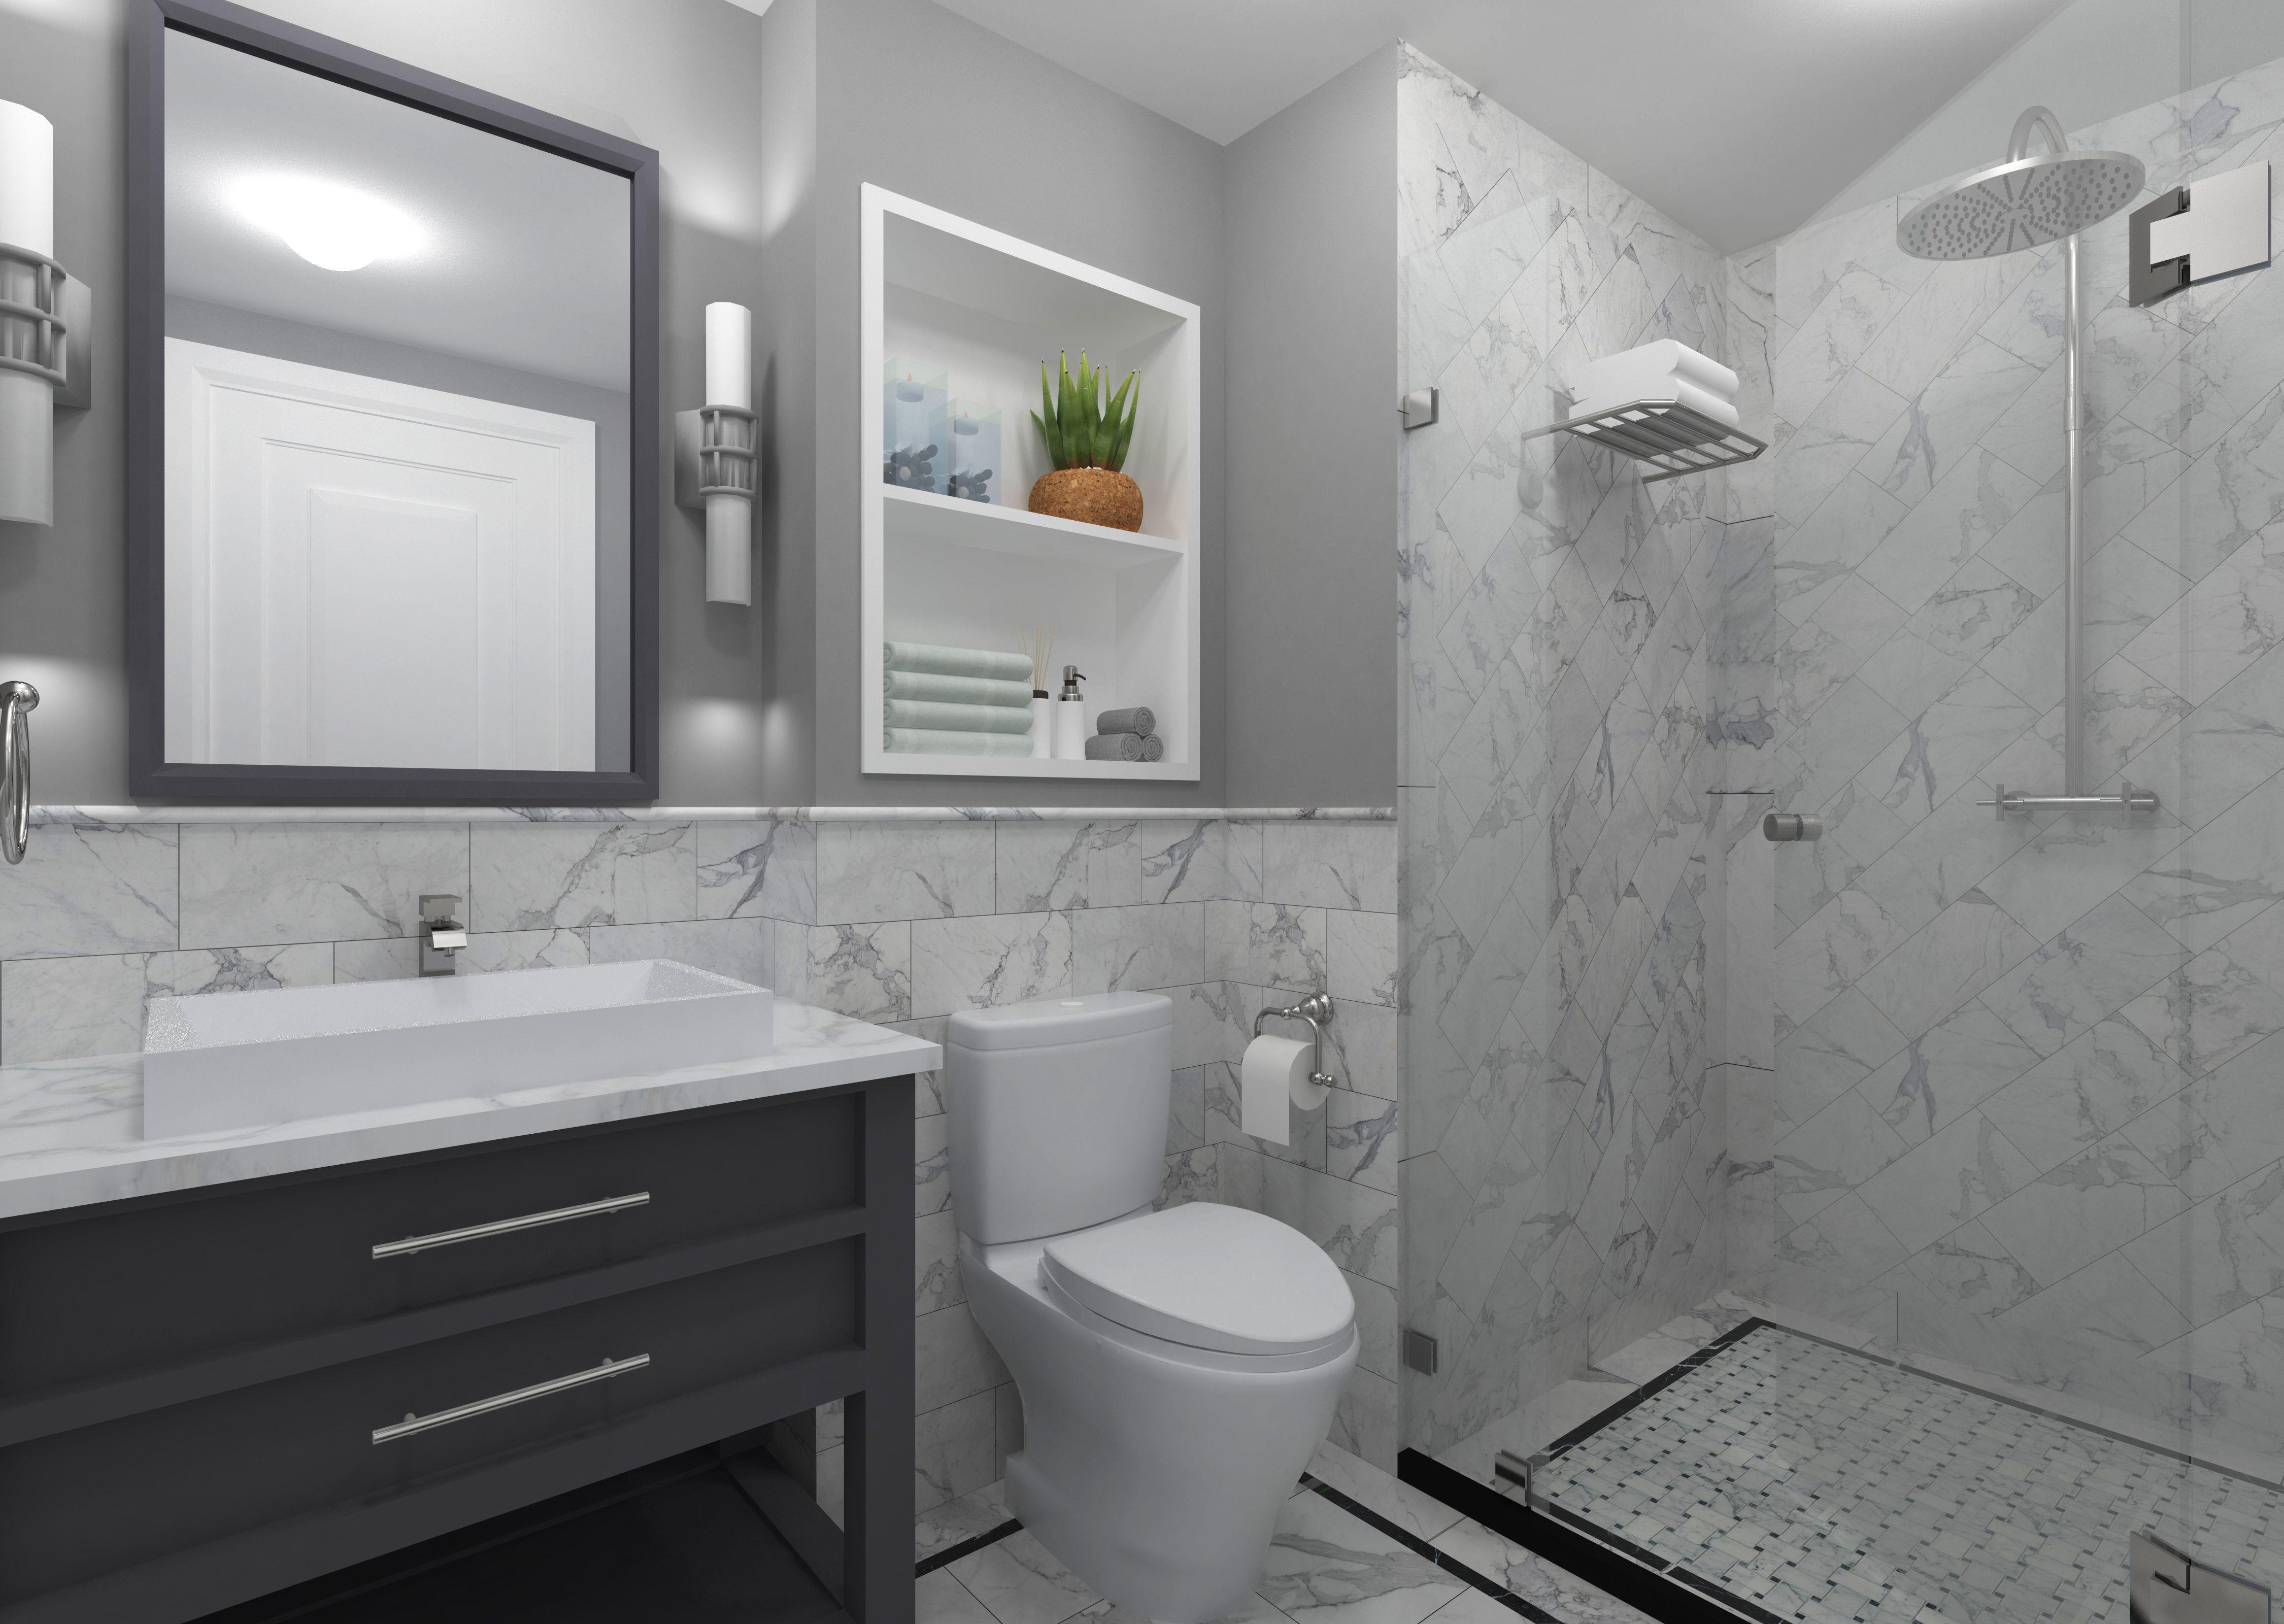 Bathroom Design Hacks For A Small Space In Nigeria Zenalen